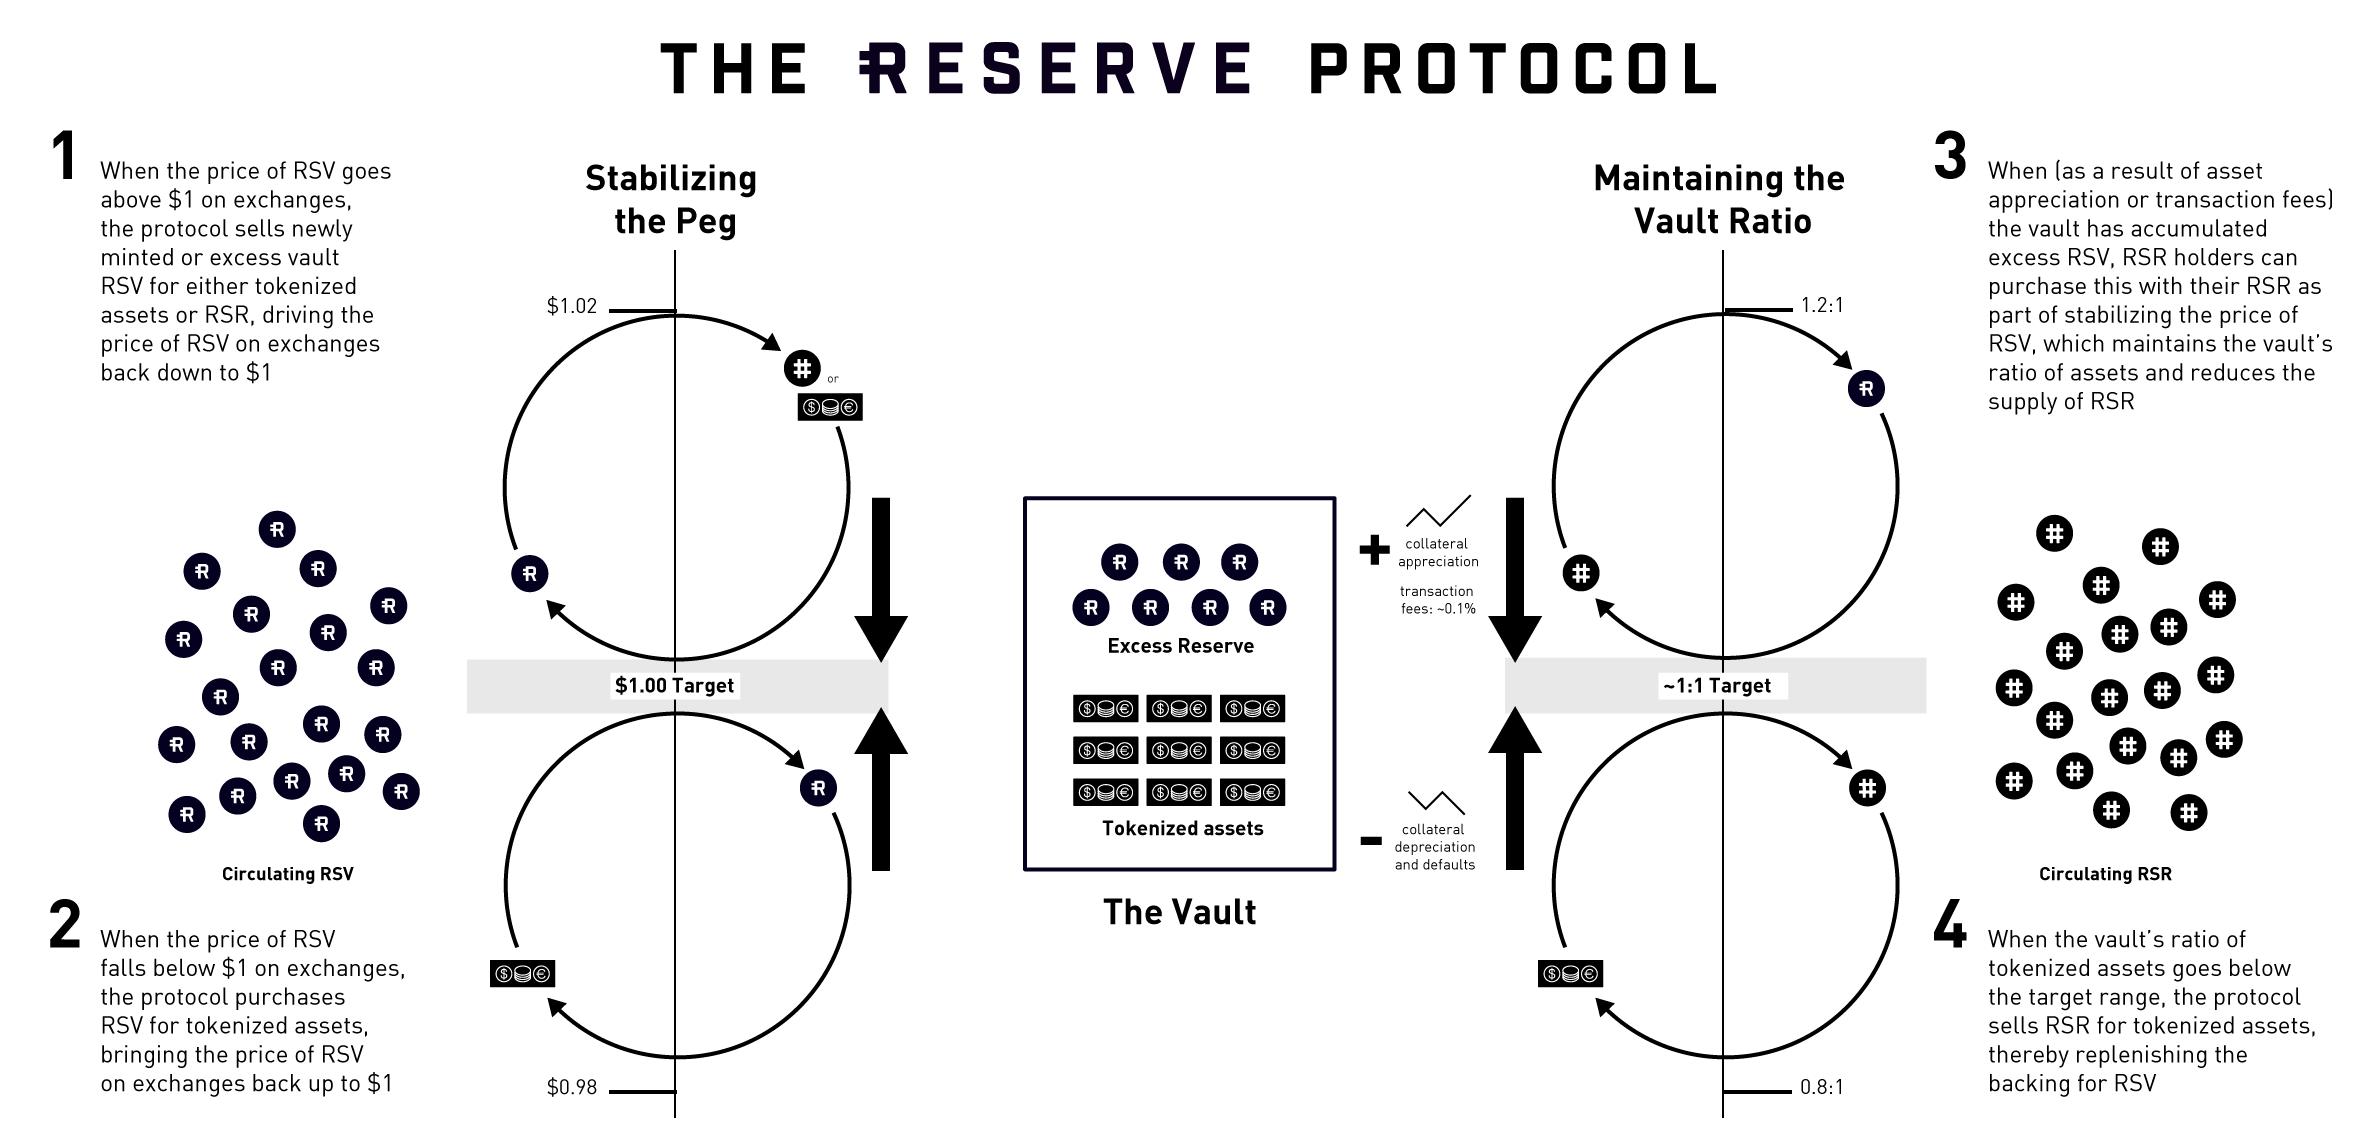 The Protocol - Reserve